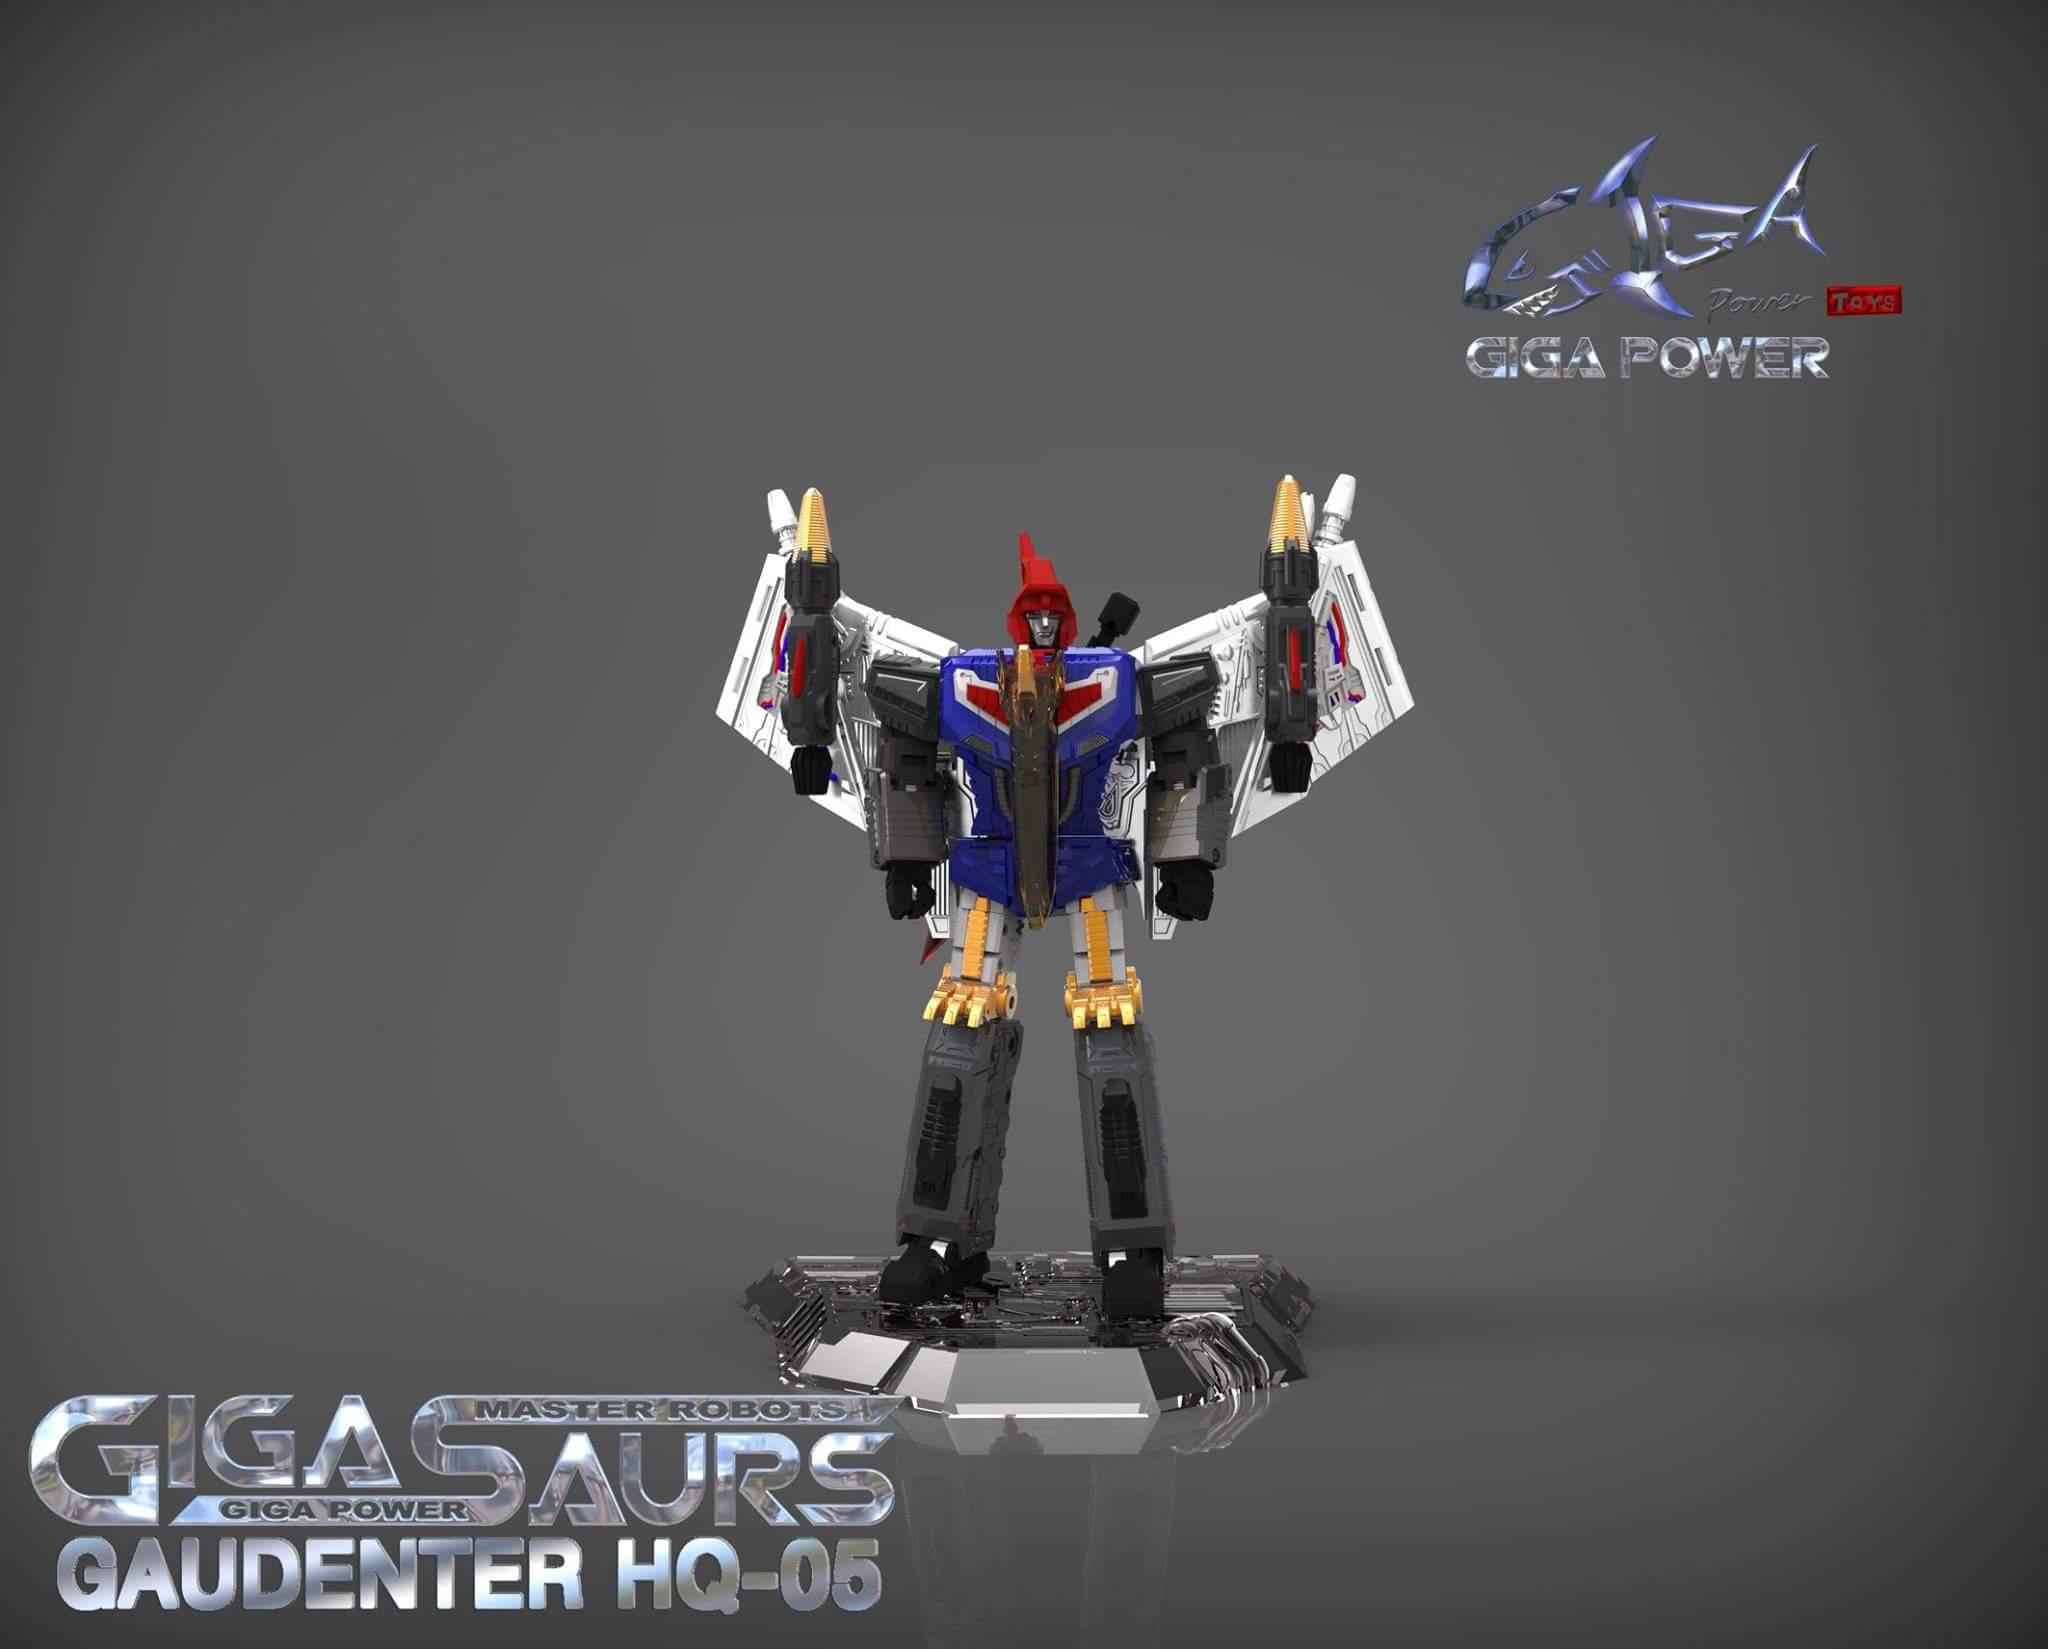 [GigaPower] Produit Tiers - Jouets HQ-01 Superator + HQ-02 Grassor + HQ-03 Guttur + HQ-04 Graviter + HQ-05 Gaudenter - aka Dinobots - Page 4 KTUc9saC